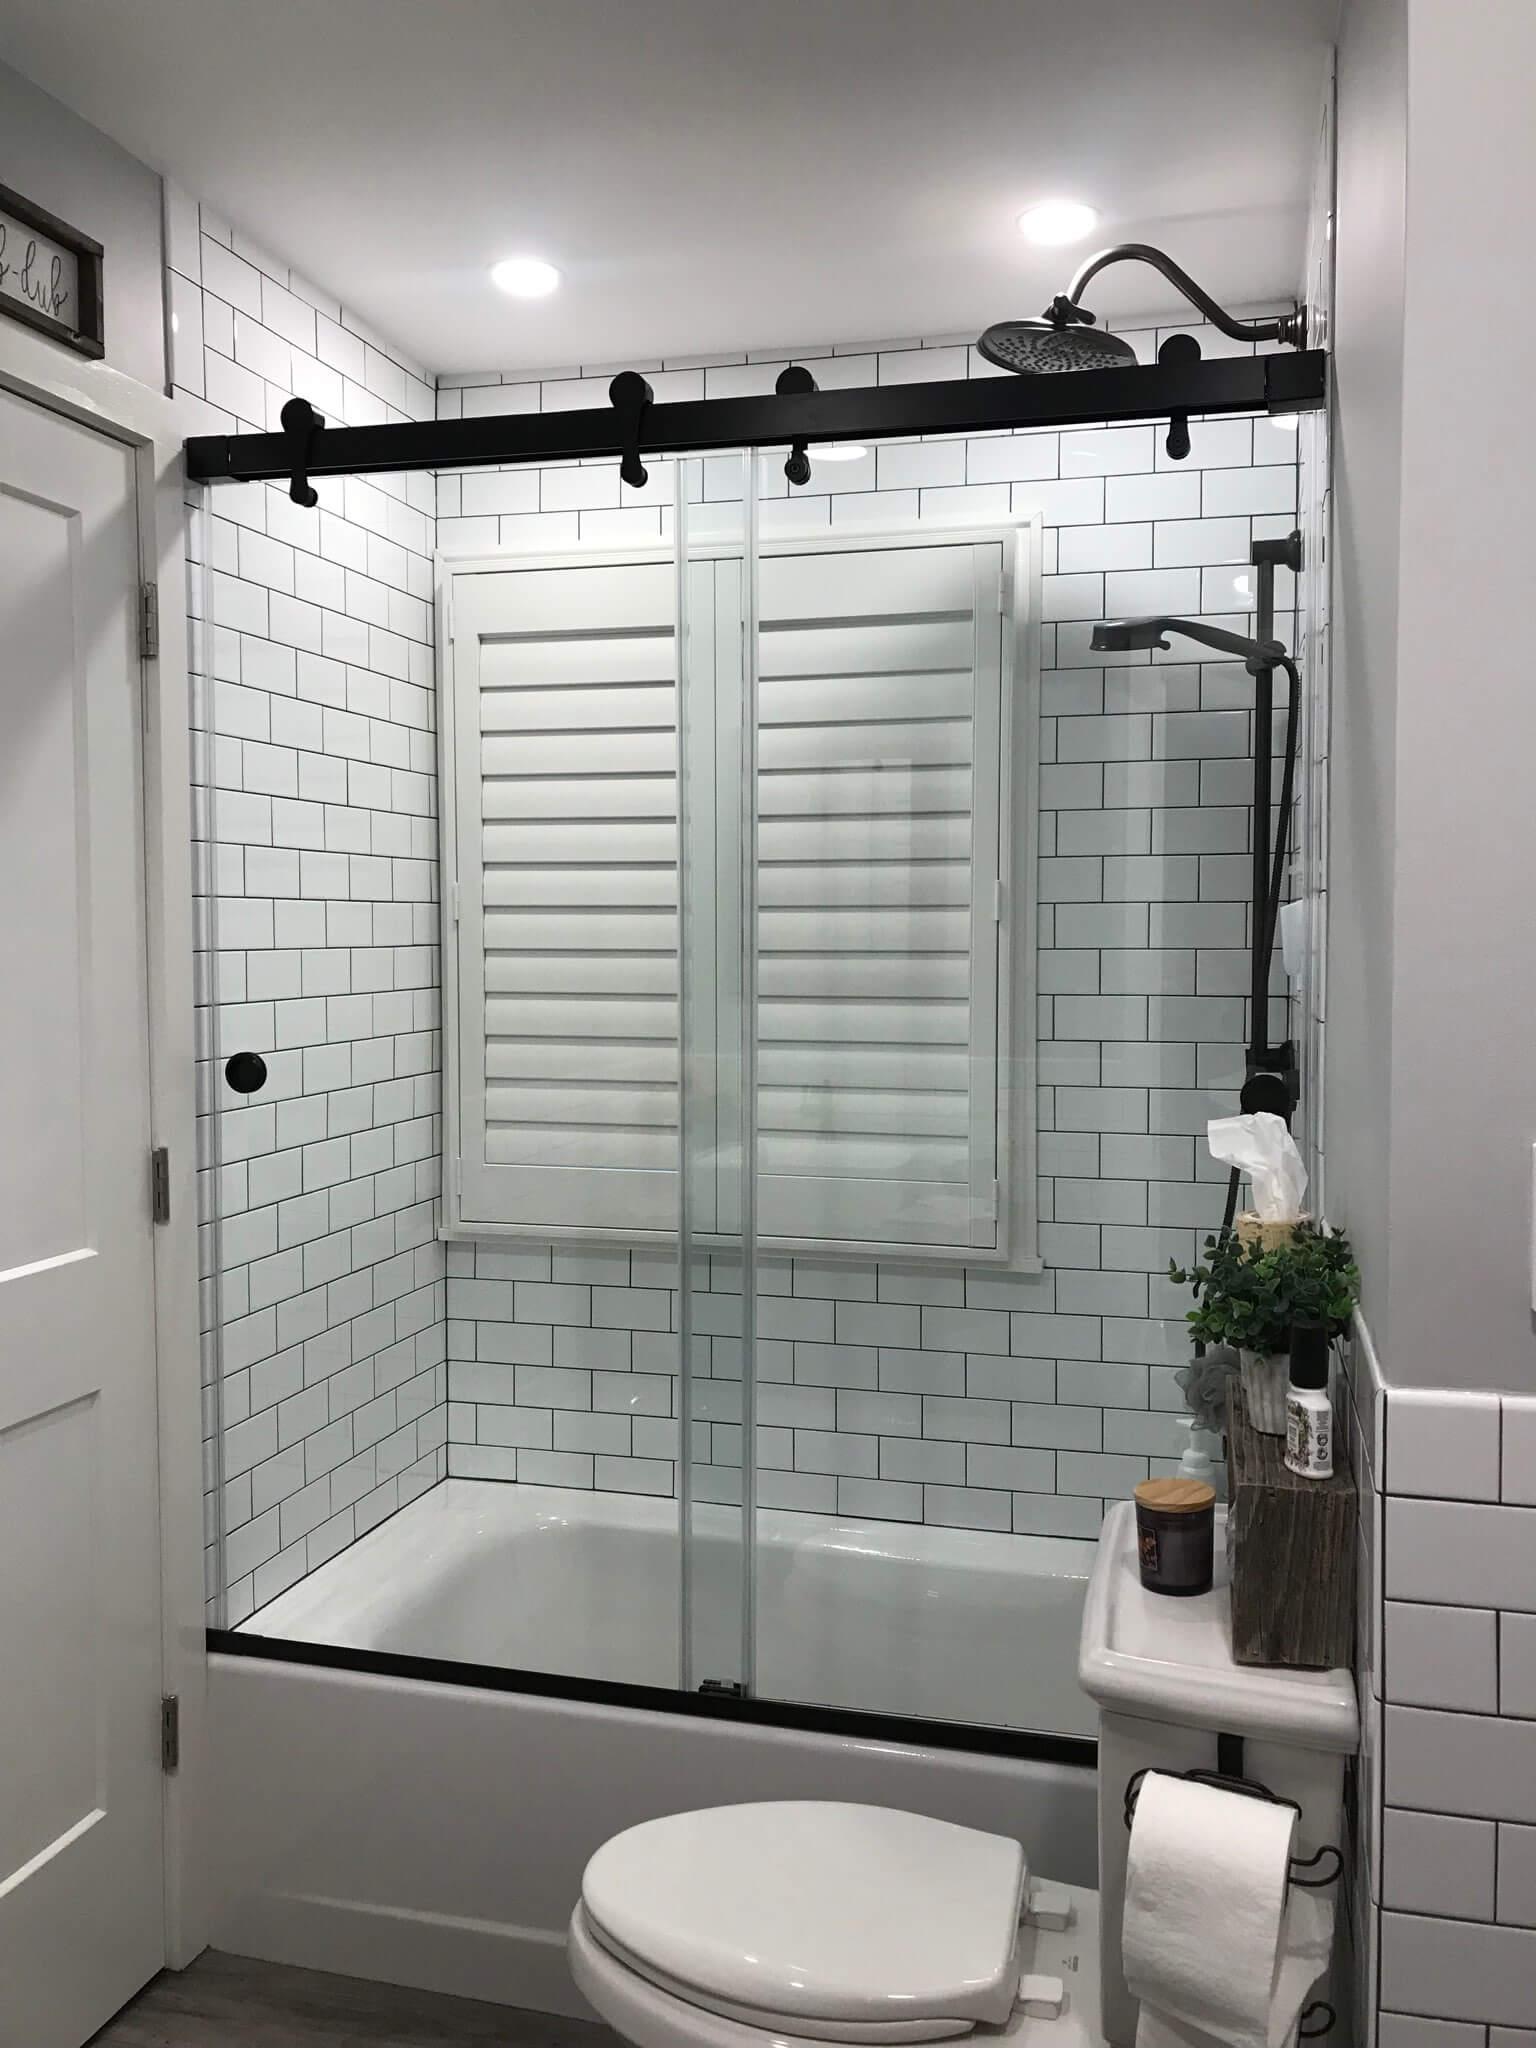 Shower Doors Tucson Az Hartman Glass 520 903 0766